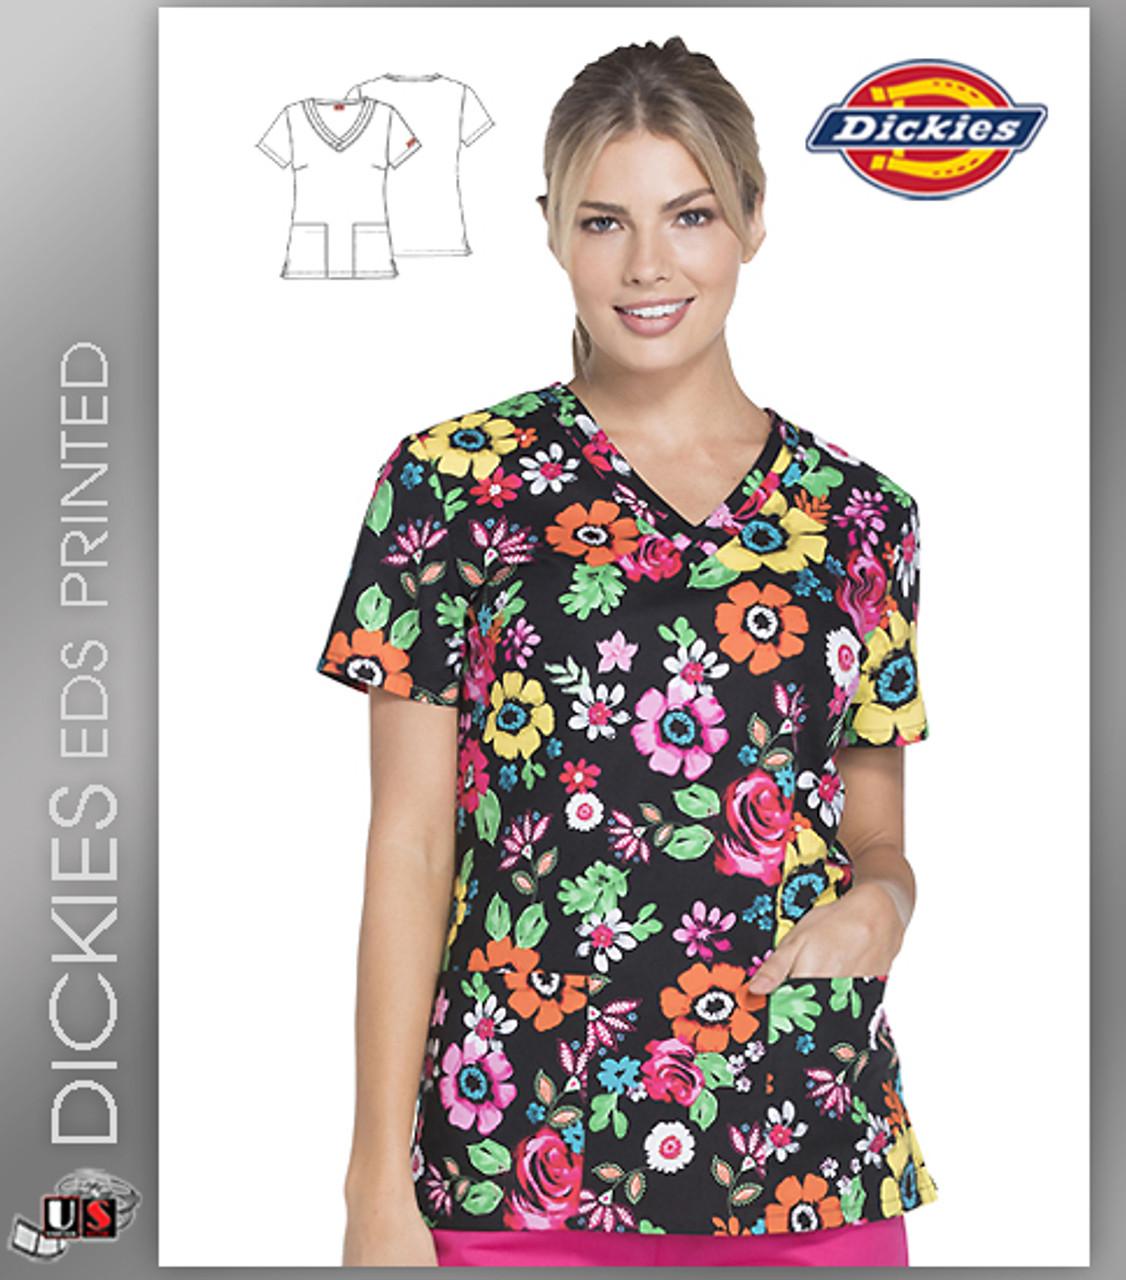 Dickies EDS Print Top Flower Festival DK708 FWFS